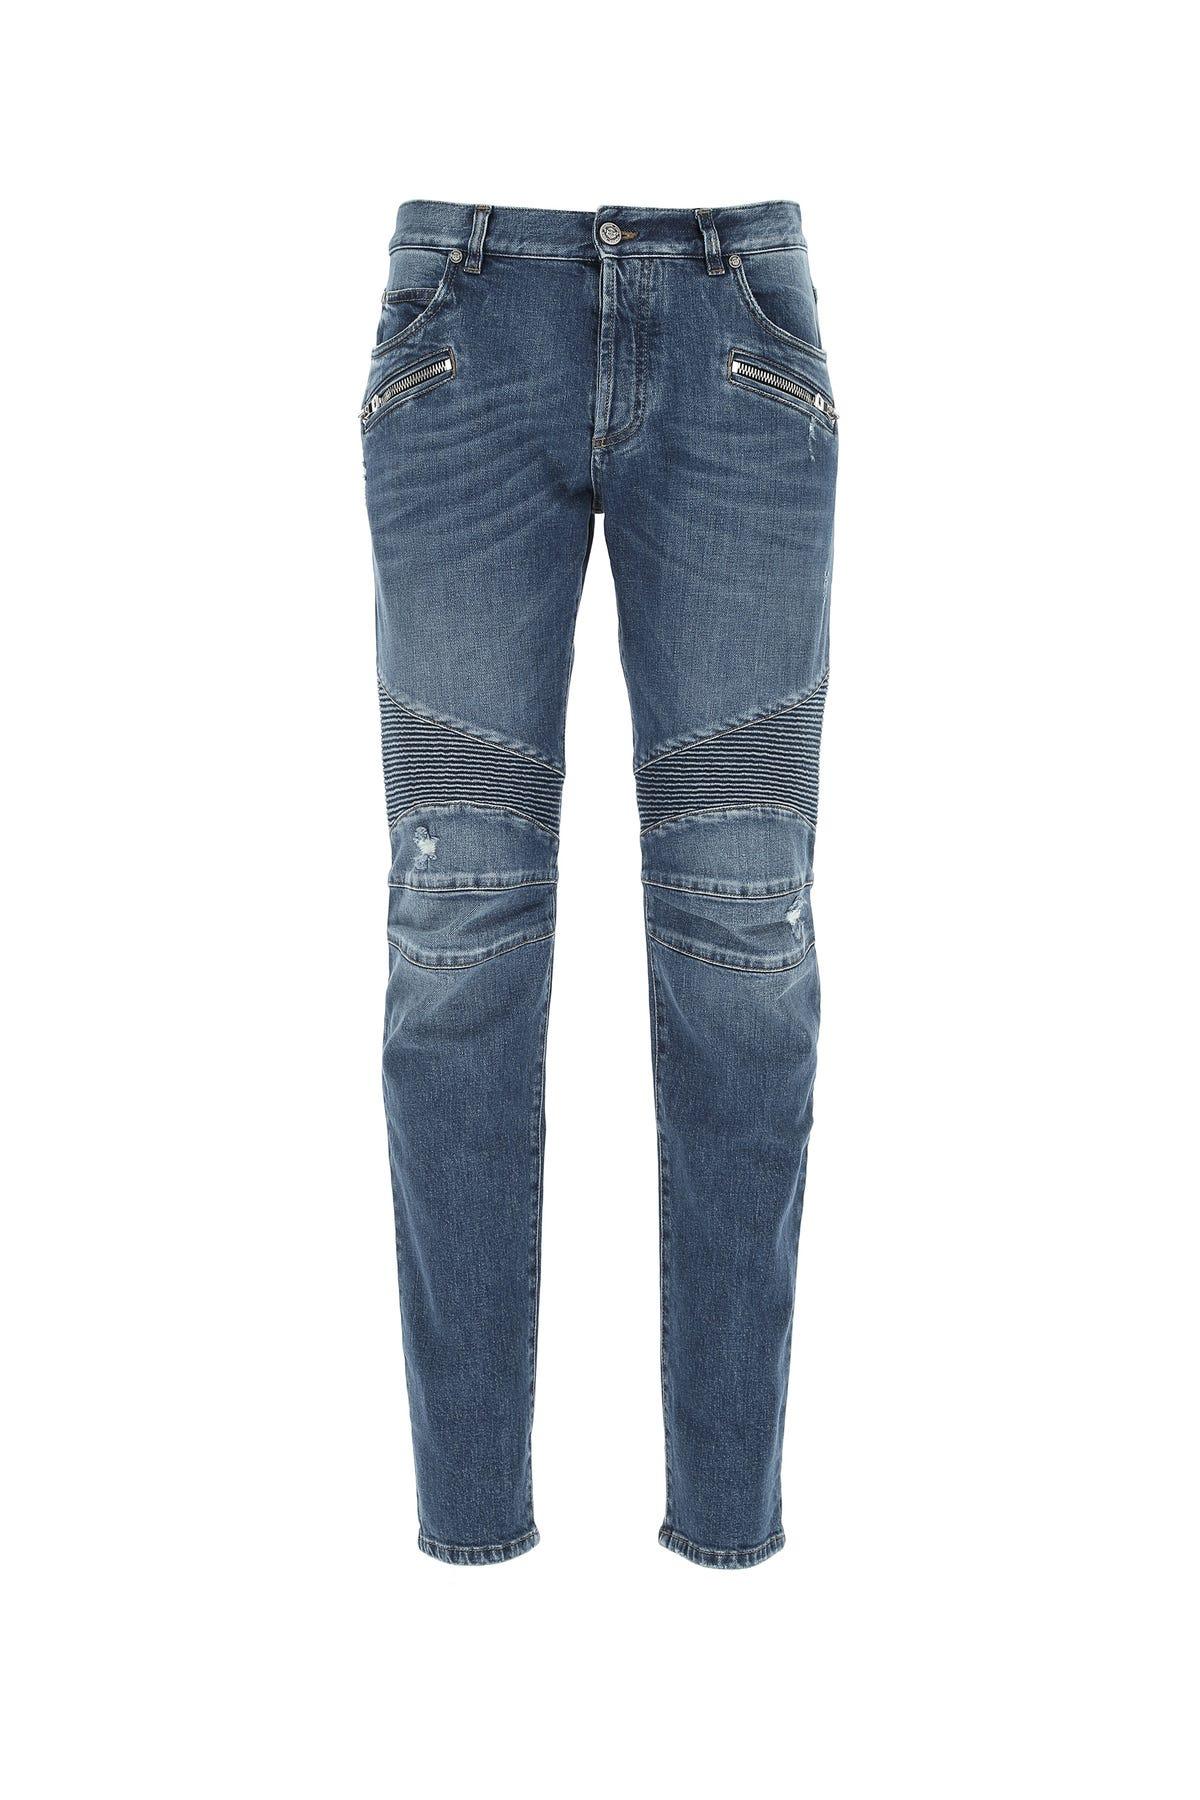 Balmain Stretch Denim Jeans  Blue  Uomo 34